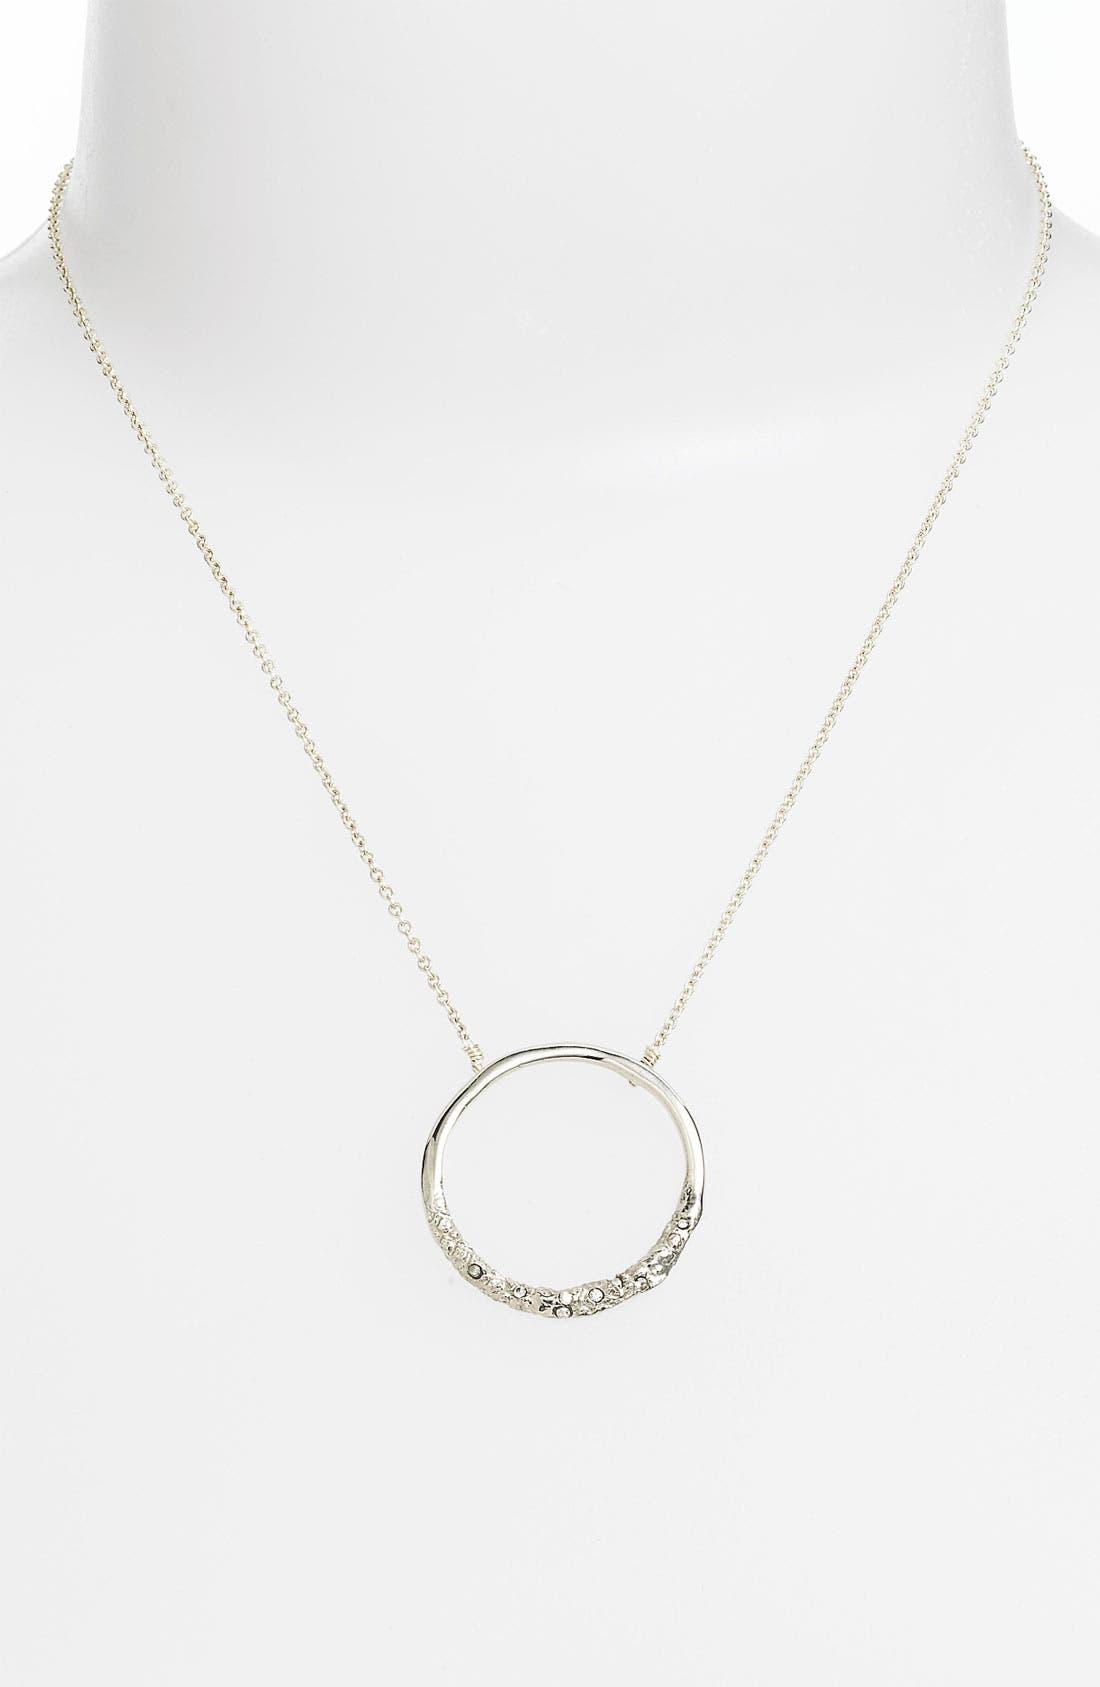 Main Image - Alexis Bittar 'Miss Havisham - New Wave' Pendant Necklace